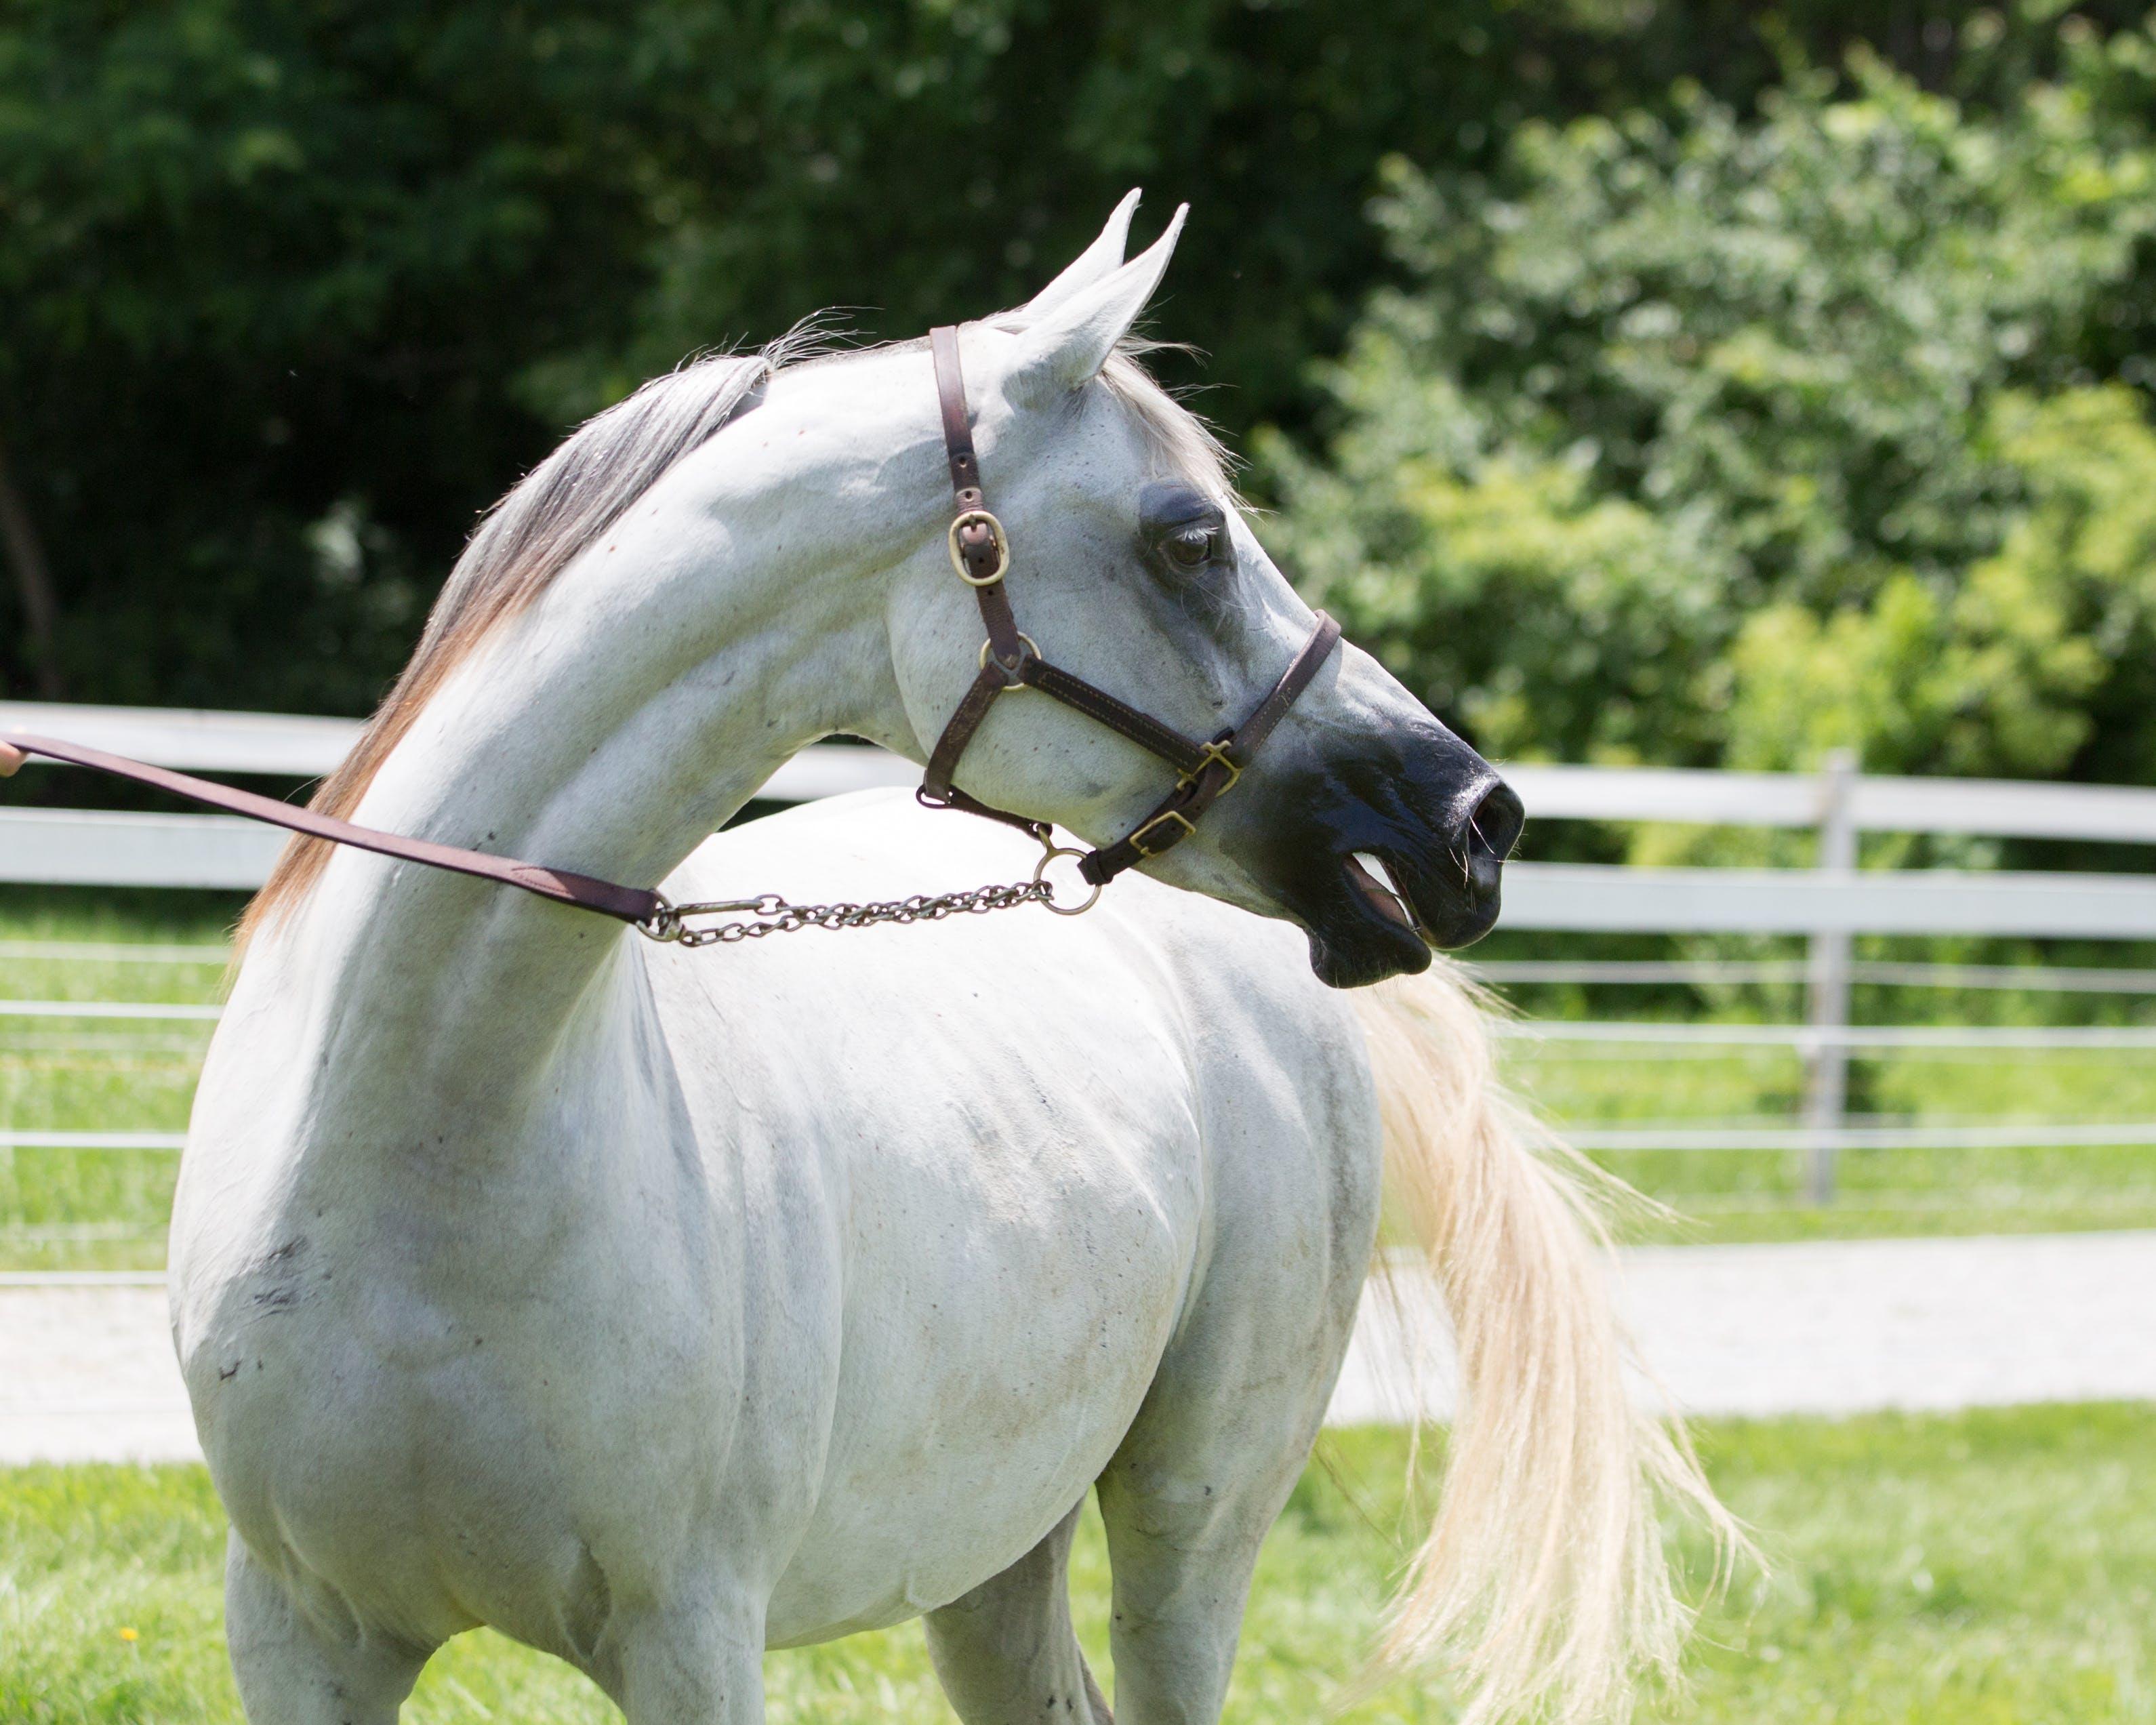 White Horse On Grass Field